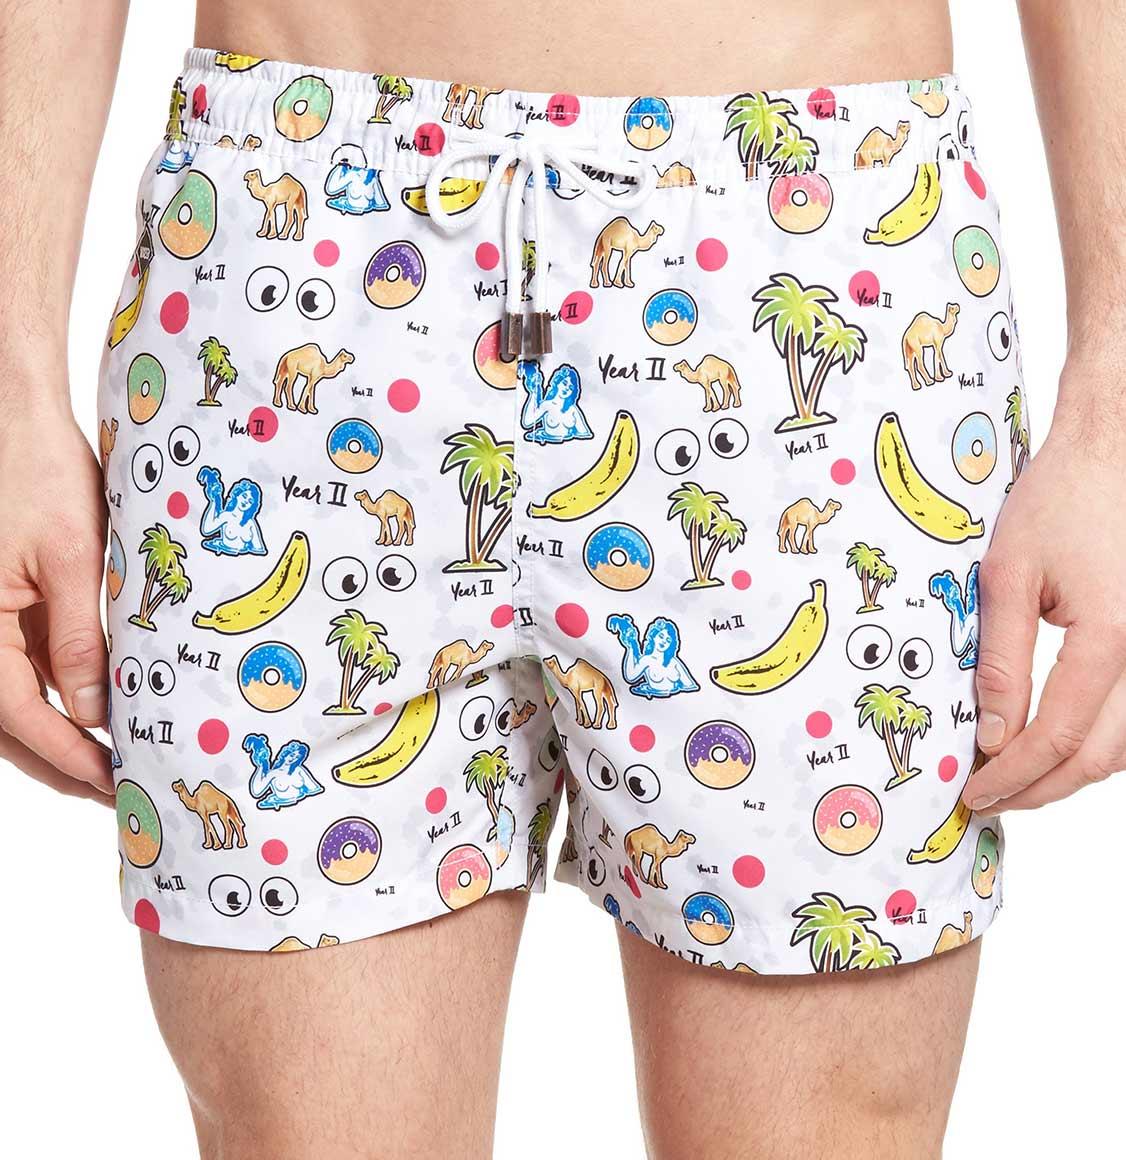 Nikben Year Two Limited Edition Swim Shorts